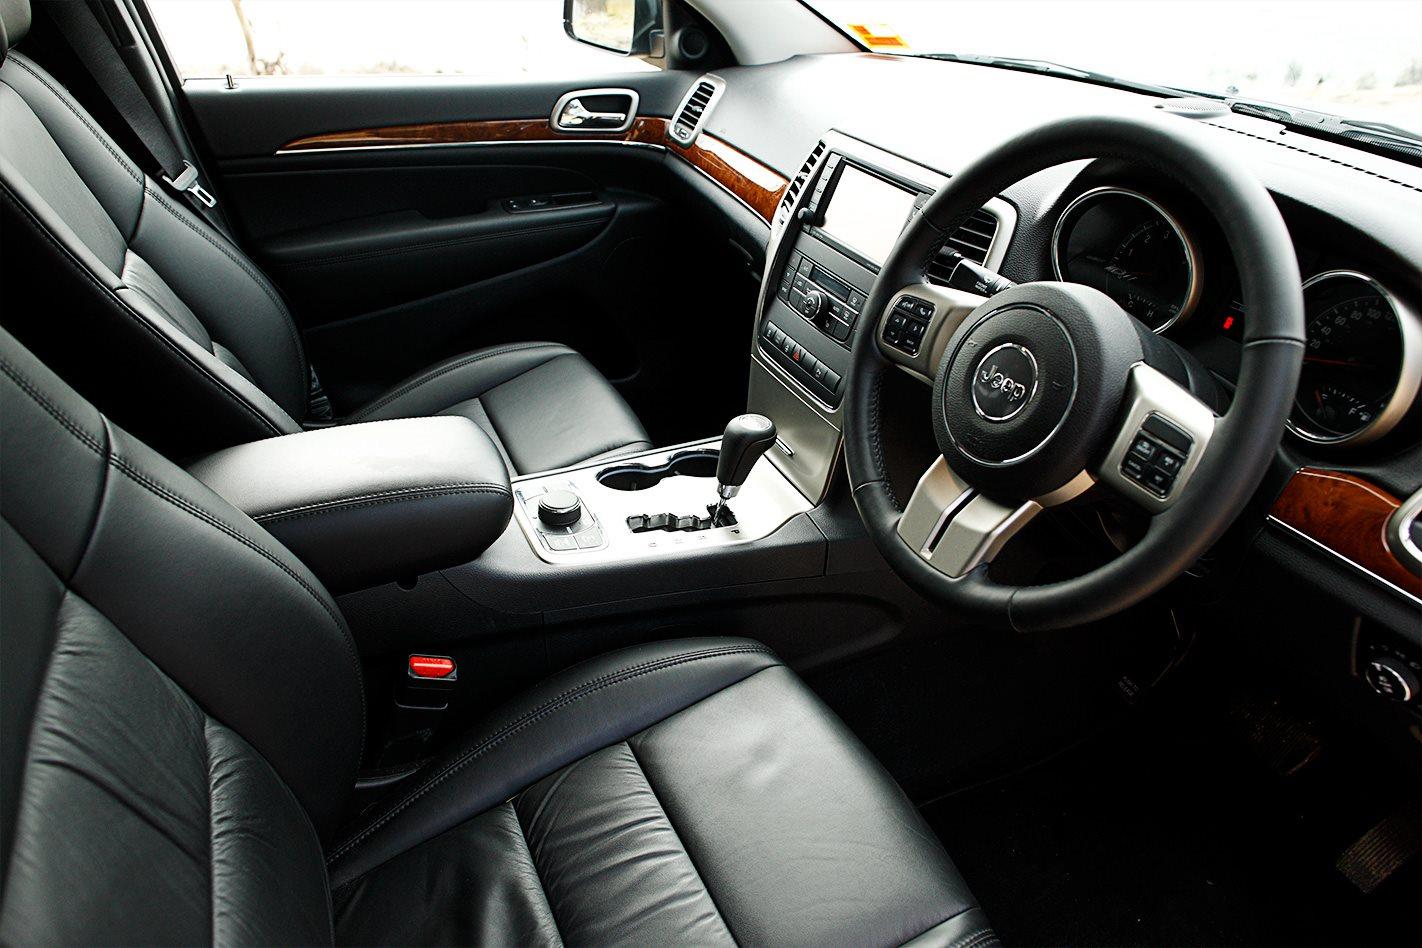 2011 toyota landcruiser 200 series vs land rover discovery 4 vs jeep grand cherokee comparison for 2011 grand cherokee interior